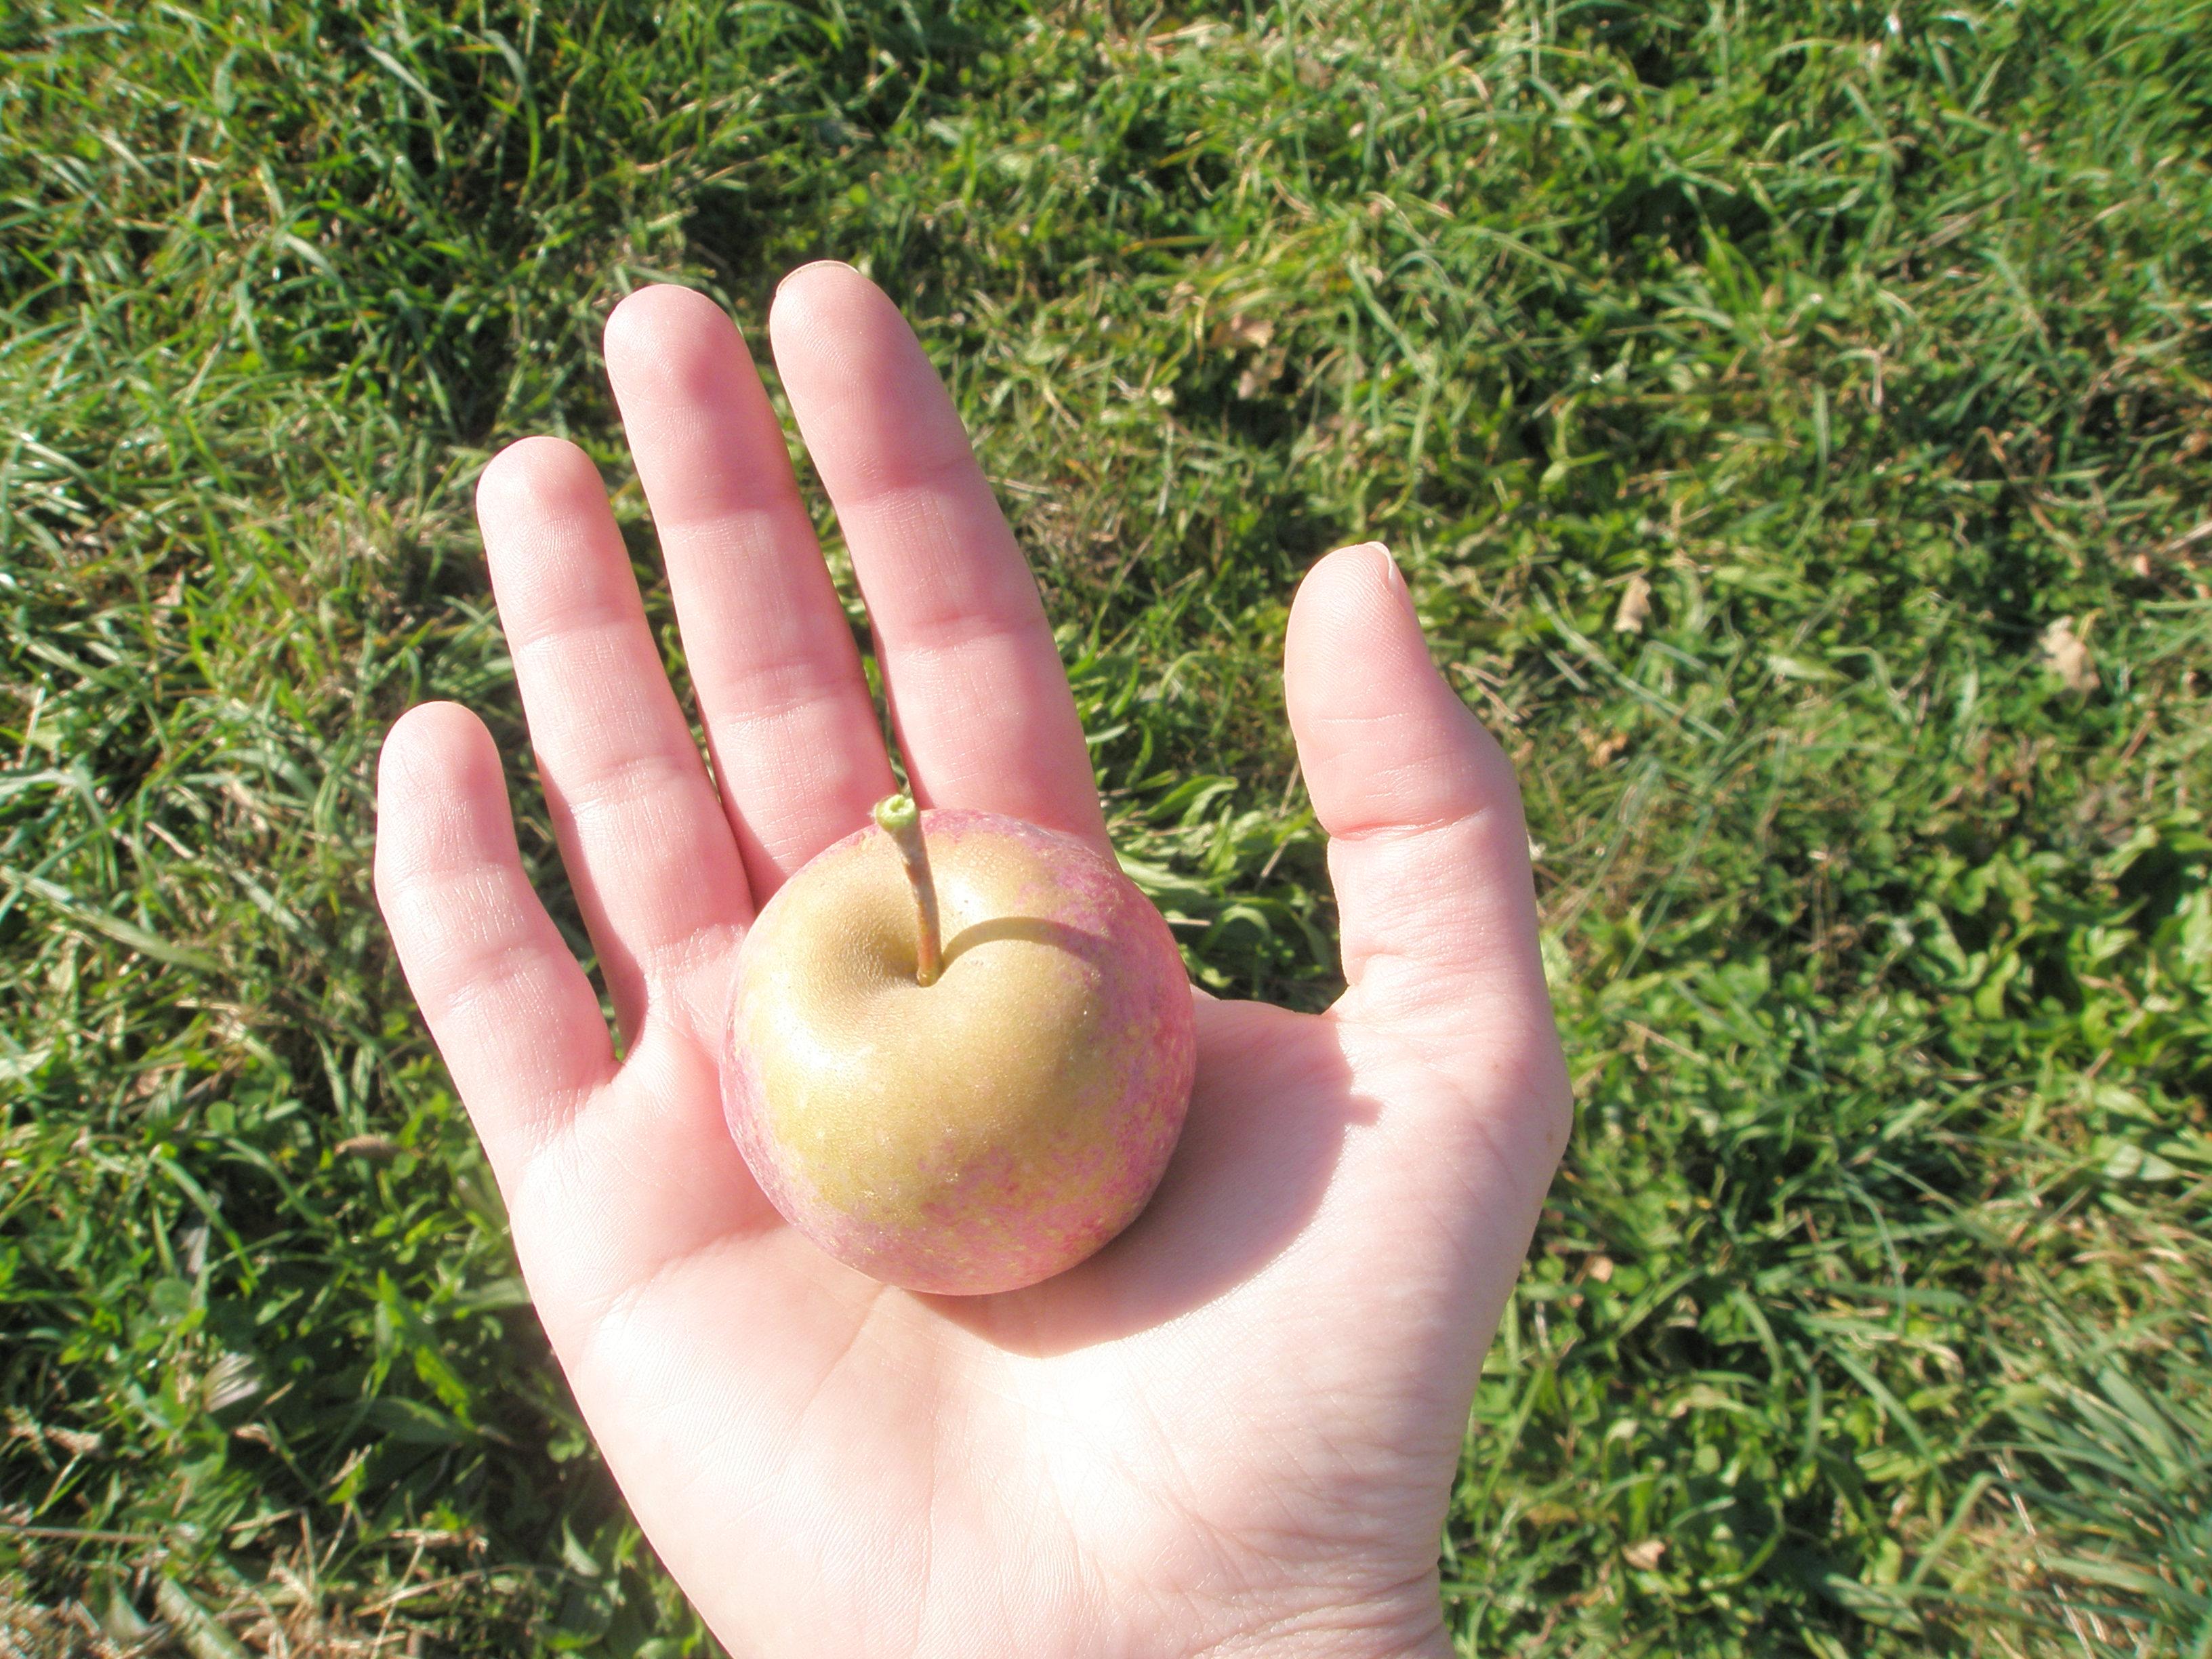 My apple is so mini...